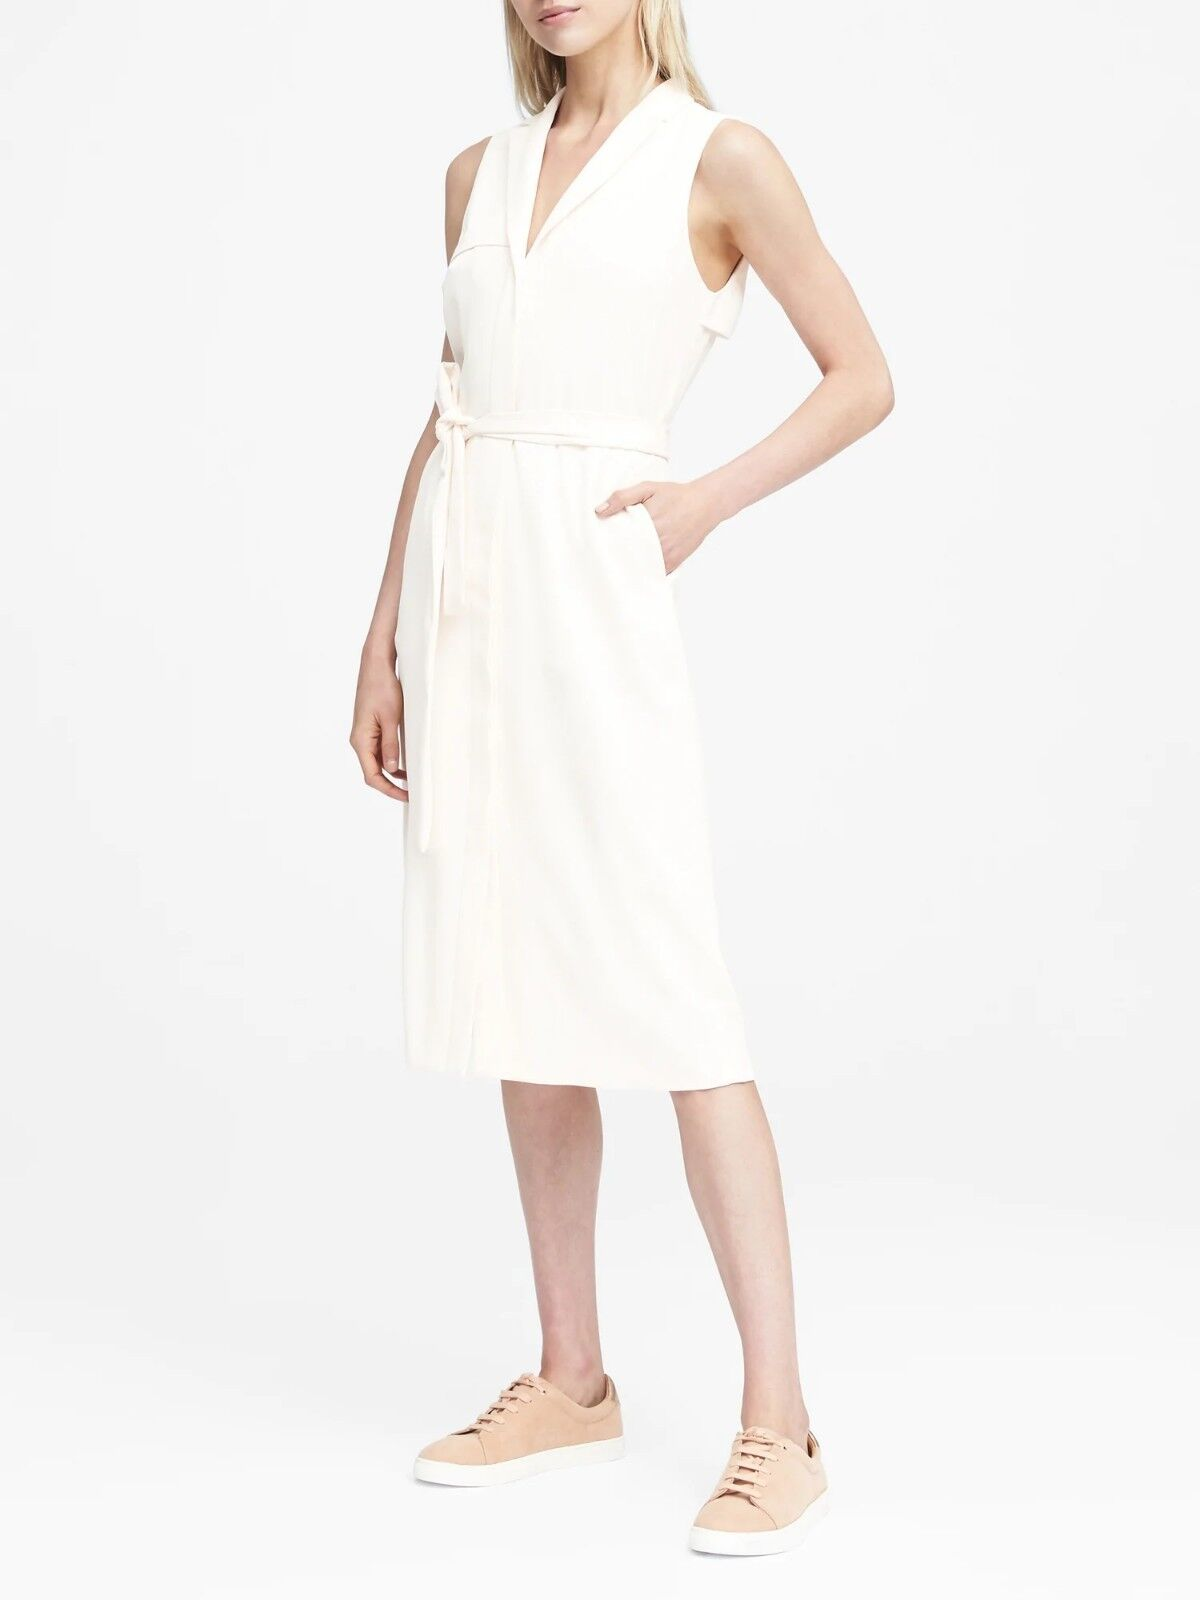 NWT Banana Republic Petite Trench Dress, Weiß Größe 2P 2 P        E1230